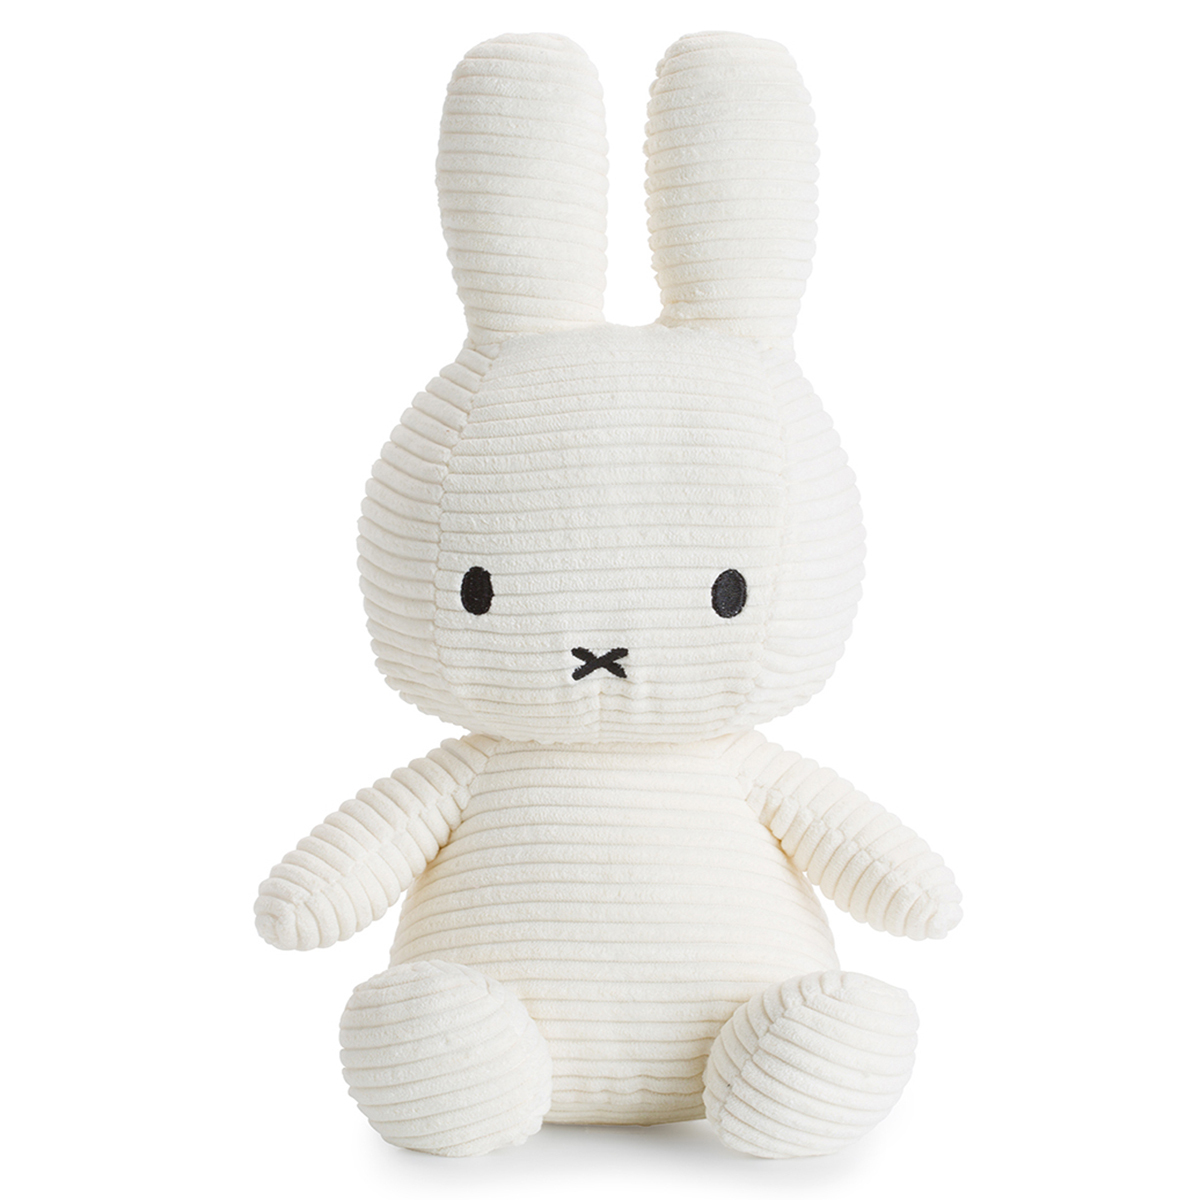 Peluche Lapin Miffy Blanc - Grand Lapin Miffy Blanc 50 cm